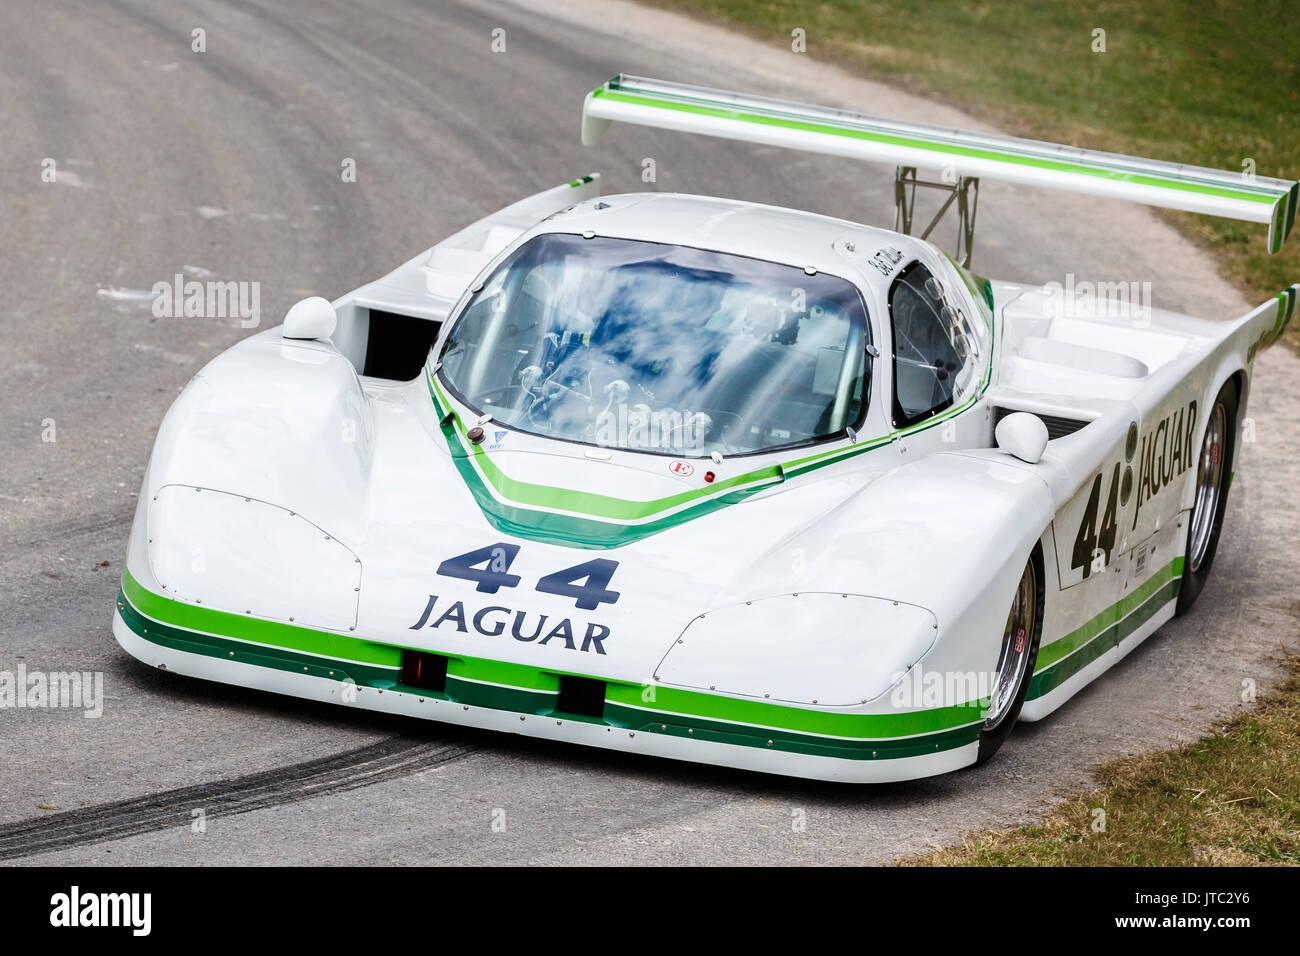 Jaguar Xjr Stock Photos & Jaguar Xjr Stock Images - Alamy